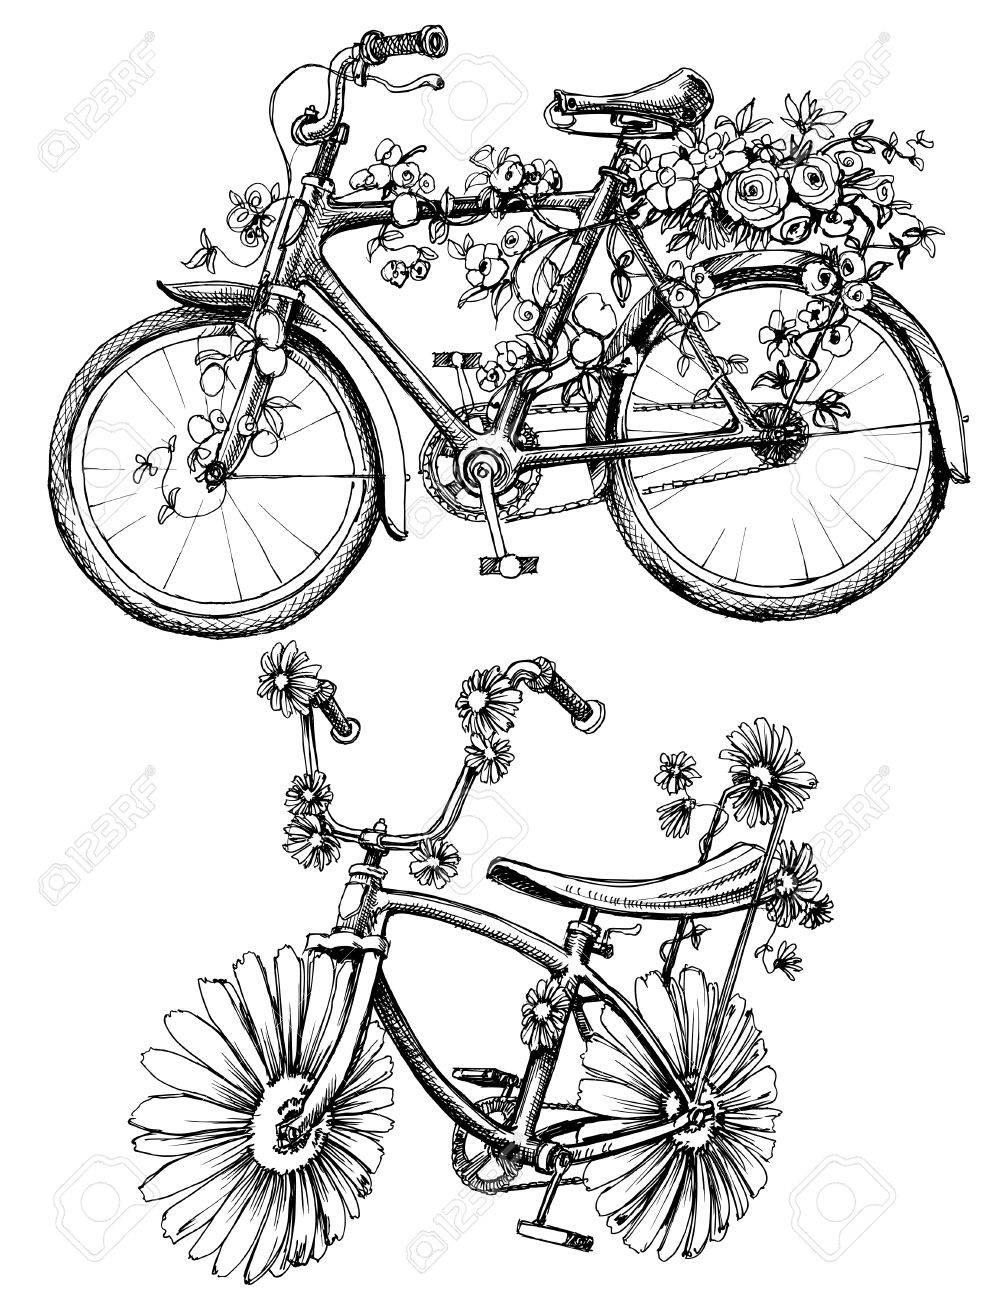 Floral bikes drawing set - 46666324